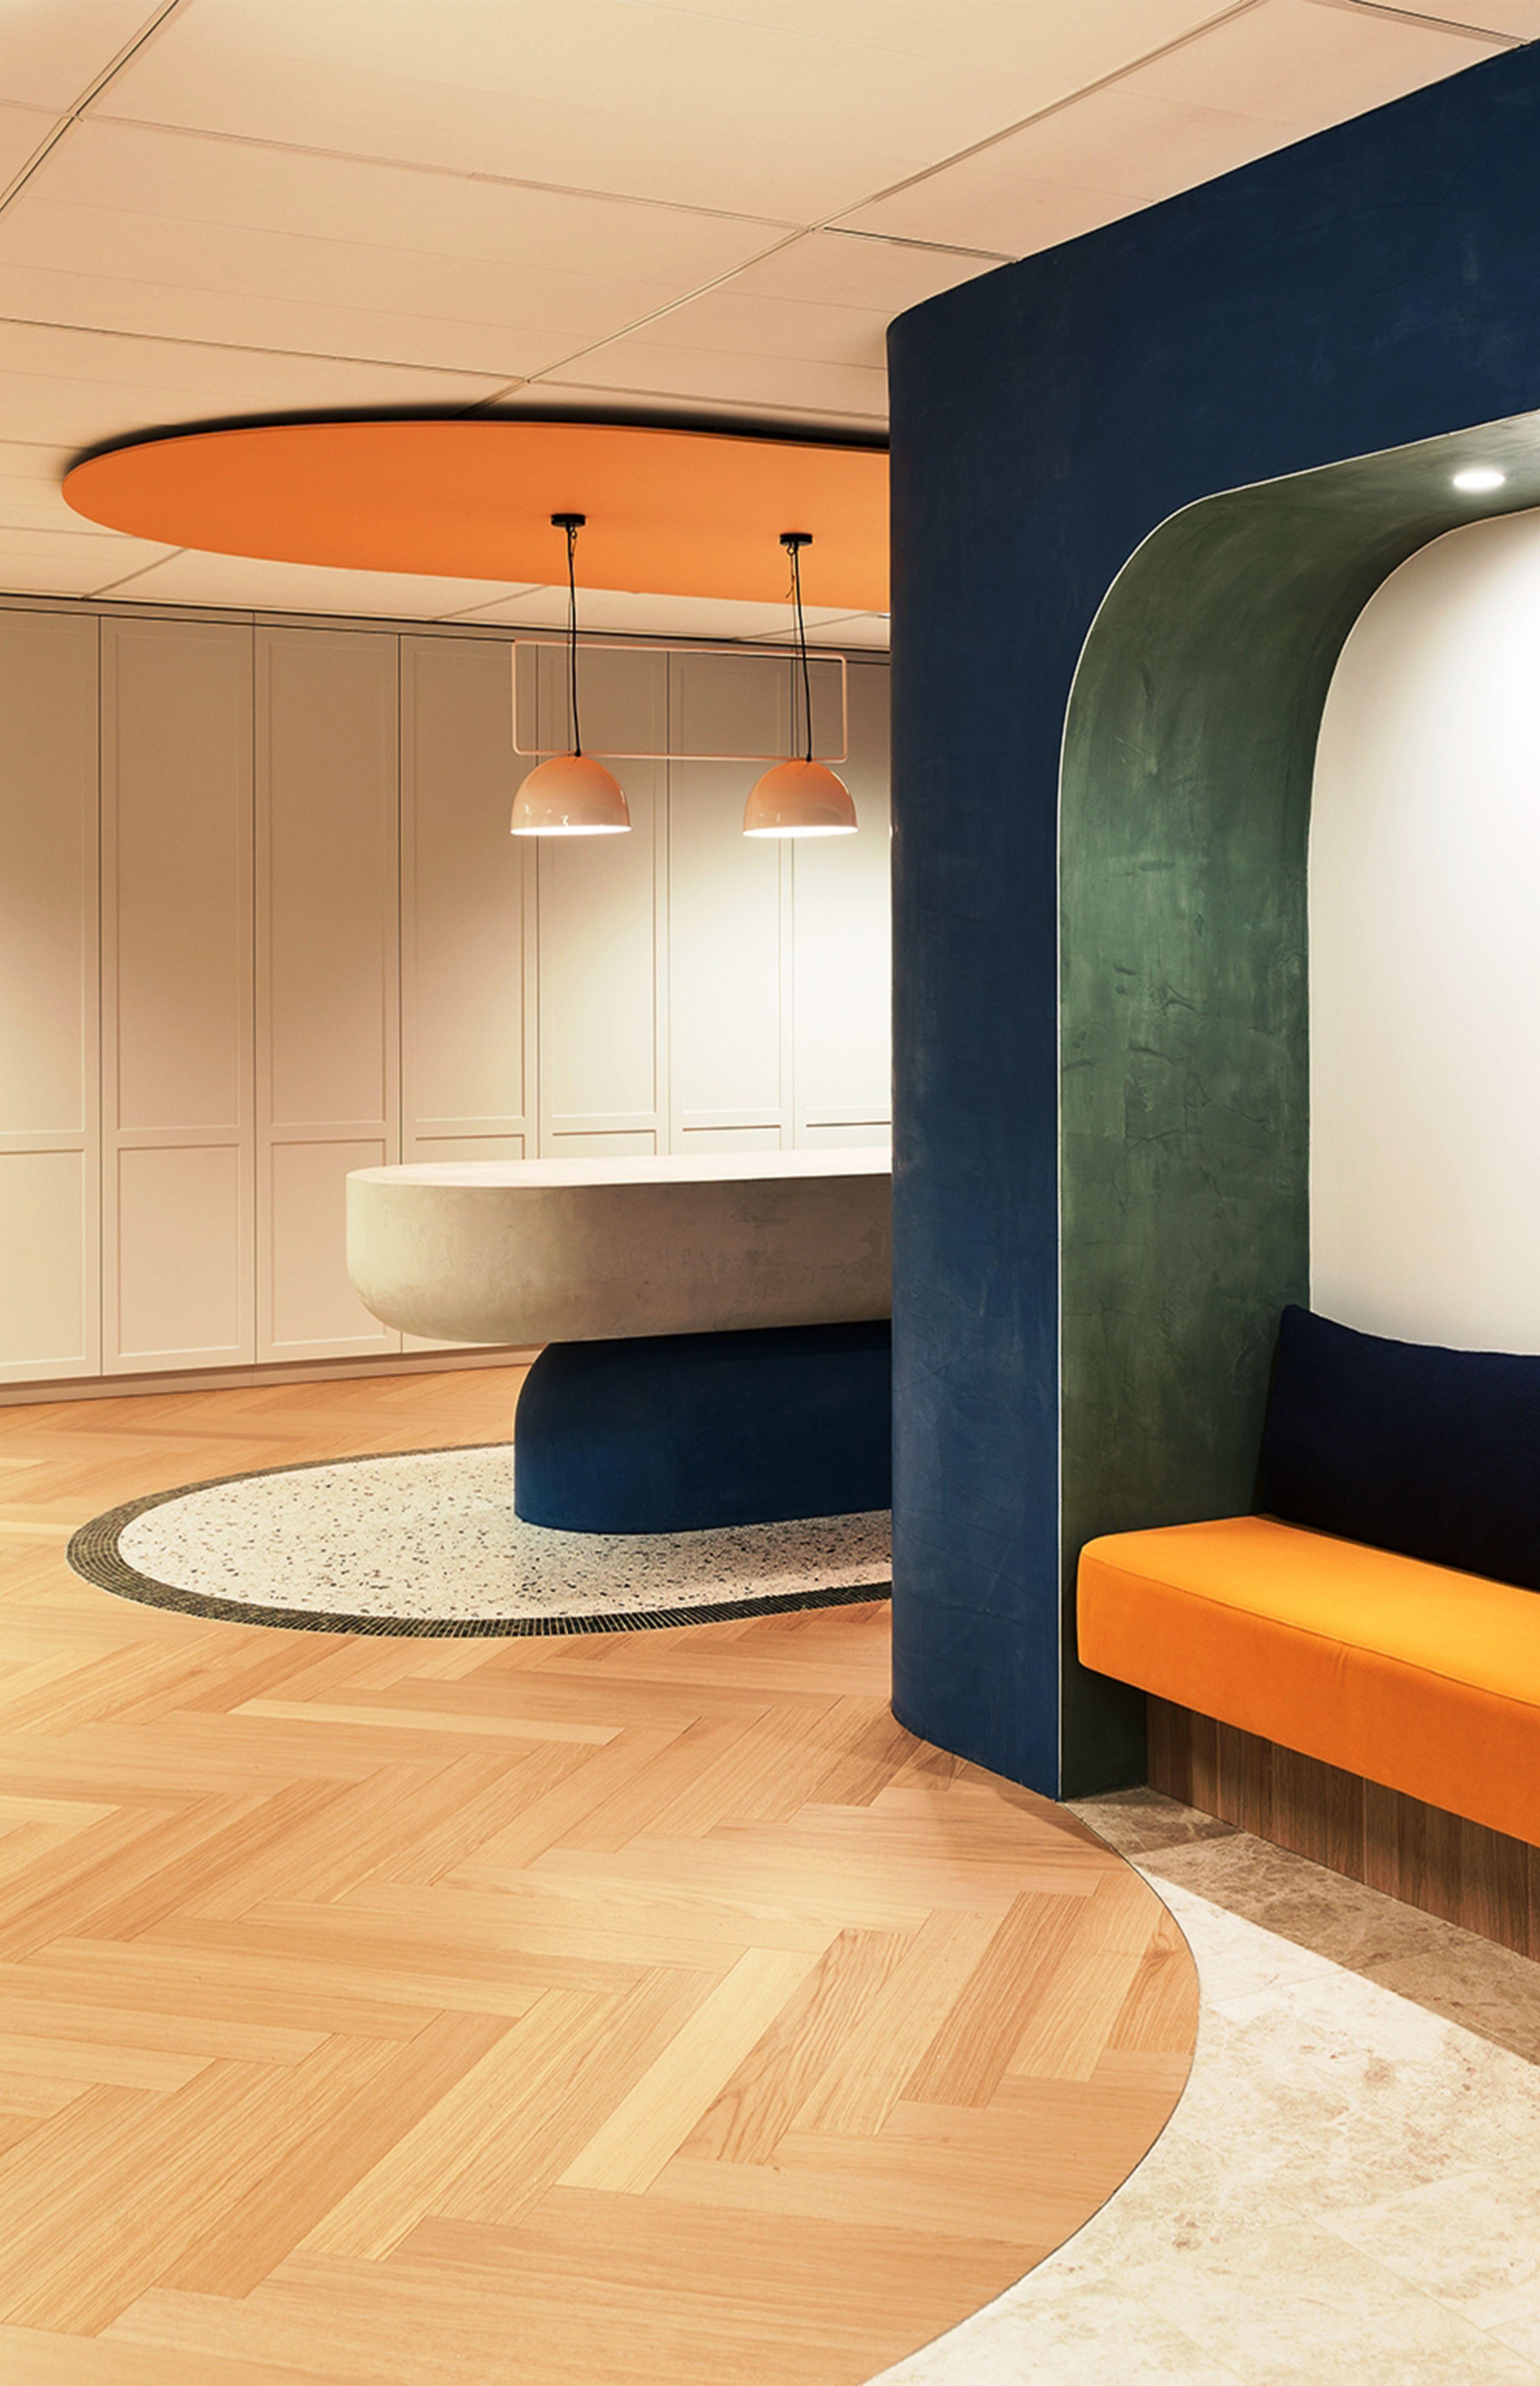 Microsoft Technology Centre By Tom Mark Henry Interior Design Software Interior Design Bedroom Small Office Interior Design